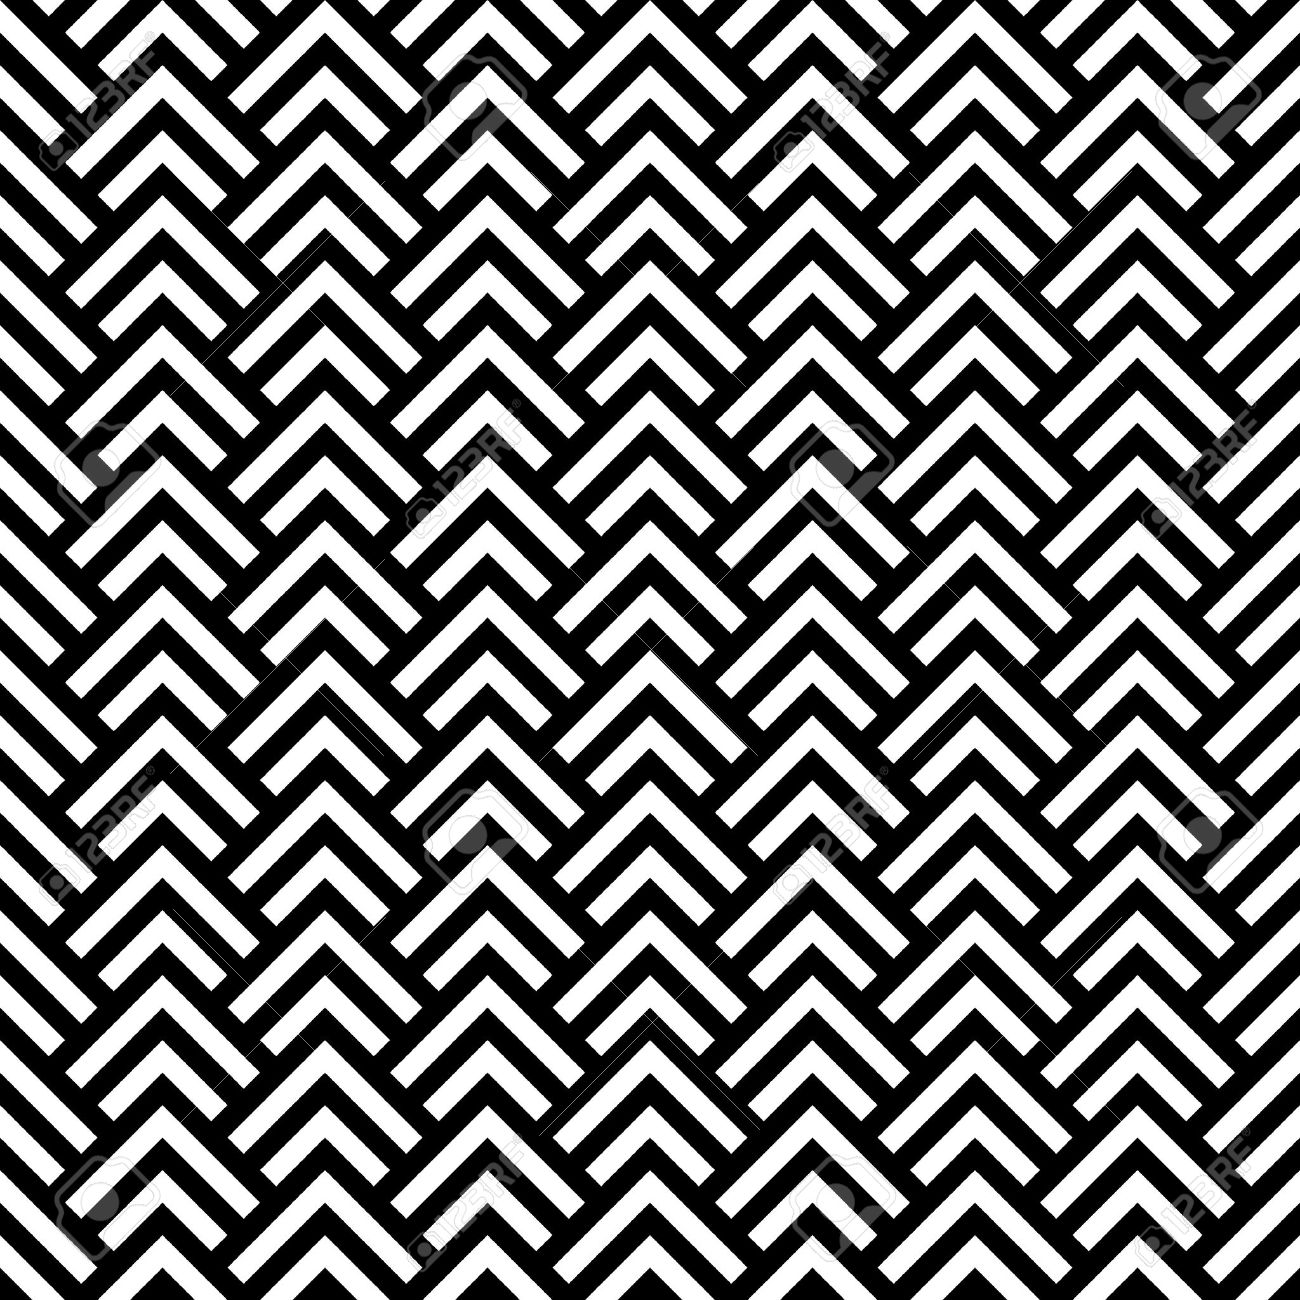 Black and white chevron geometric seamless pattern, vector - 24206013